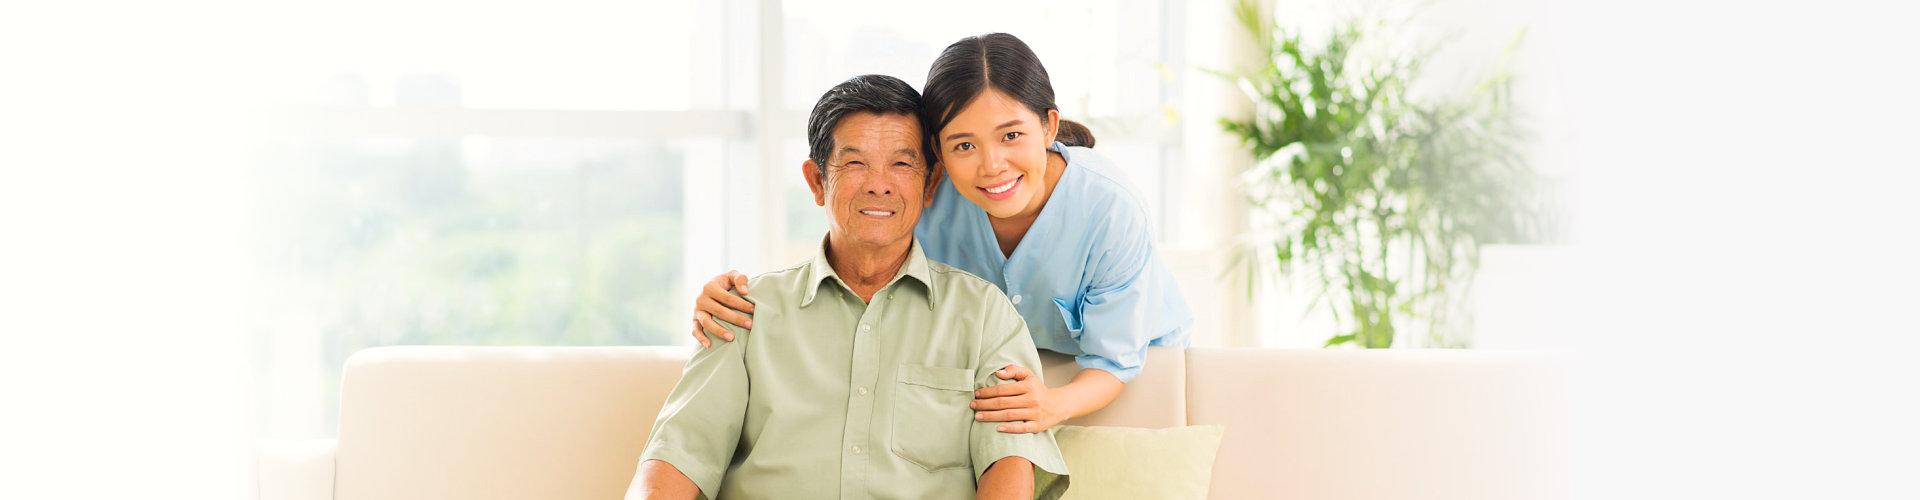 caregiver and senior man are smiling